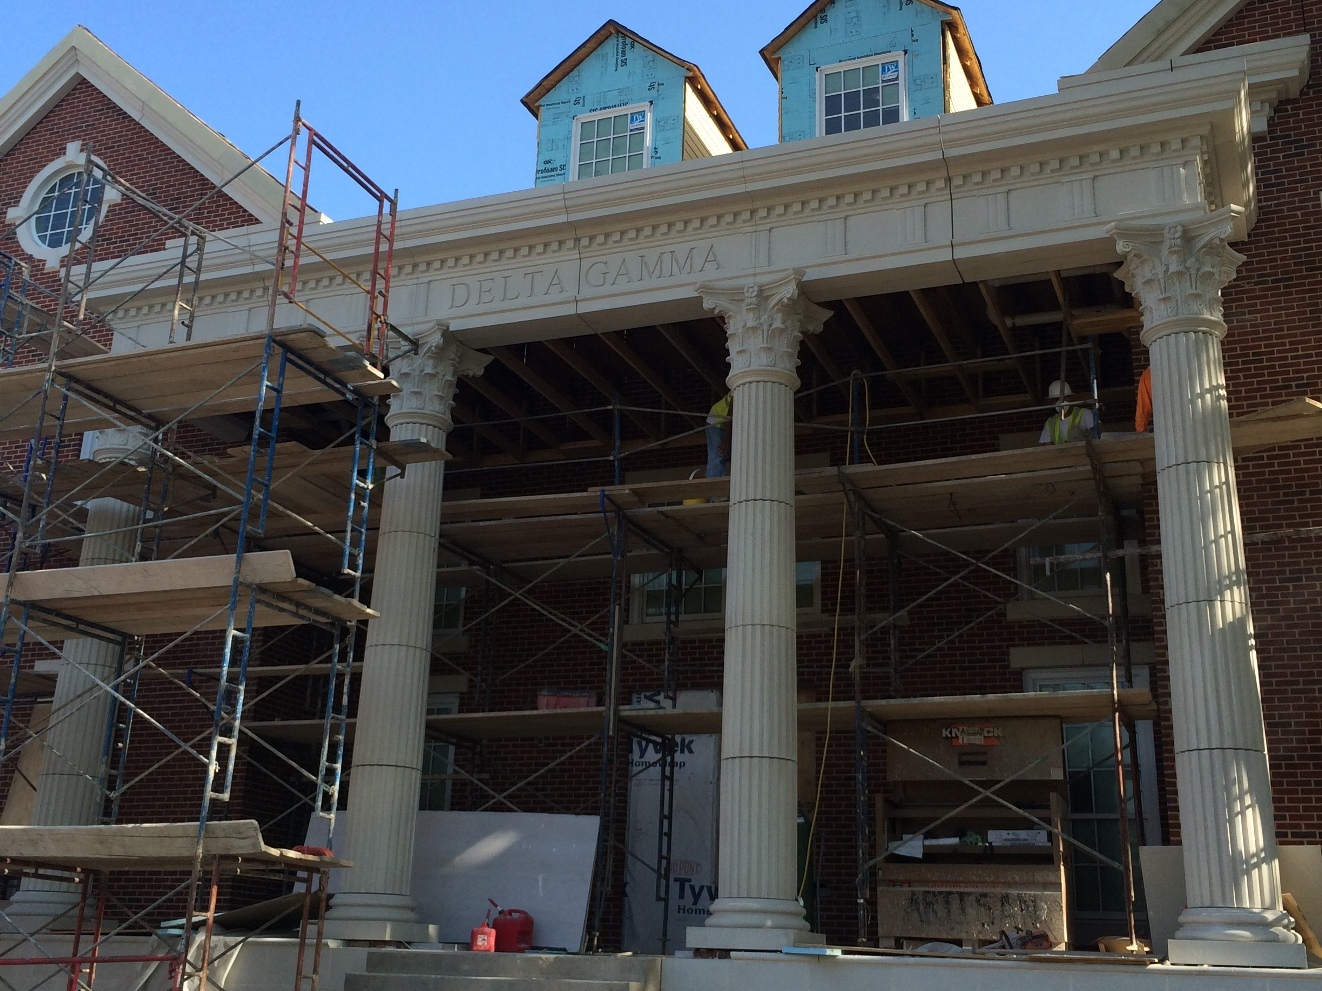 GFRC Fluted Columns, Corinthian Capitals | SMU Delta Gamma Sorority House